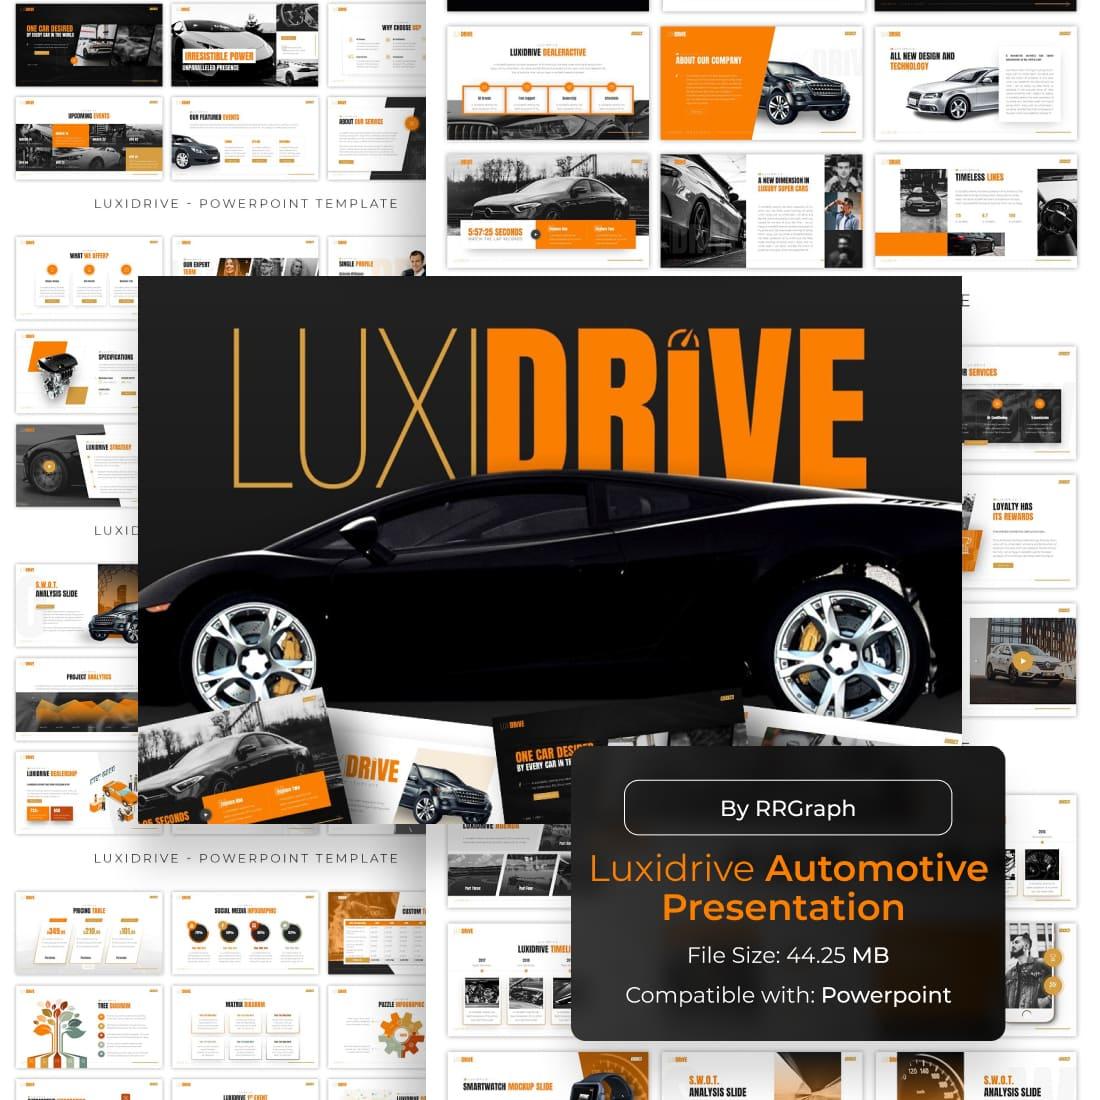 01 Luxidrive Automotive Presentation 1100x1100 1